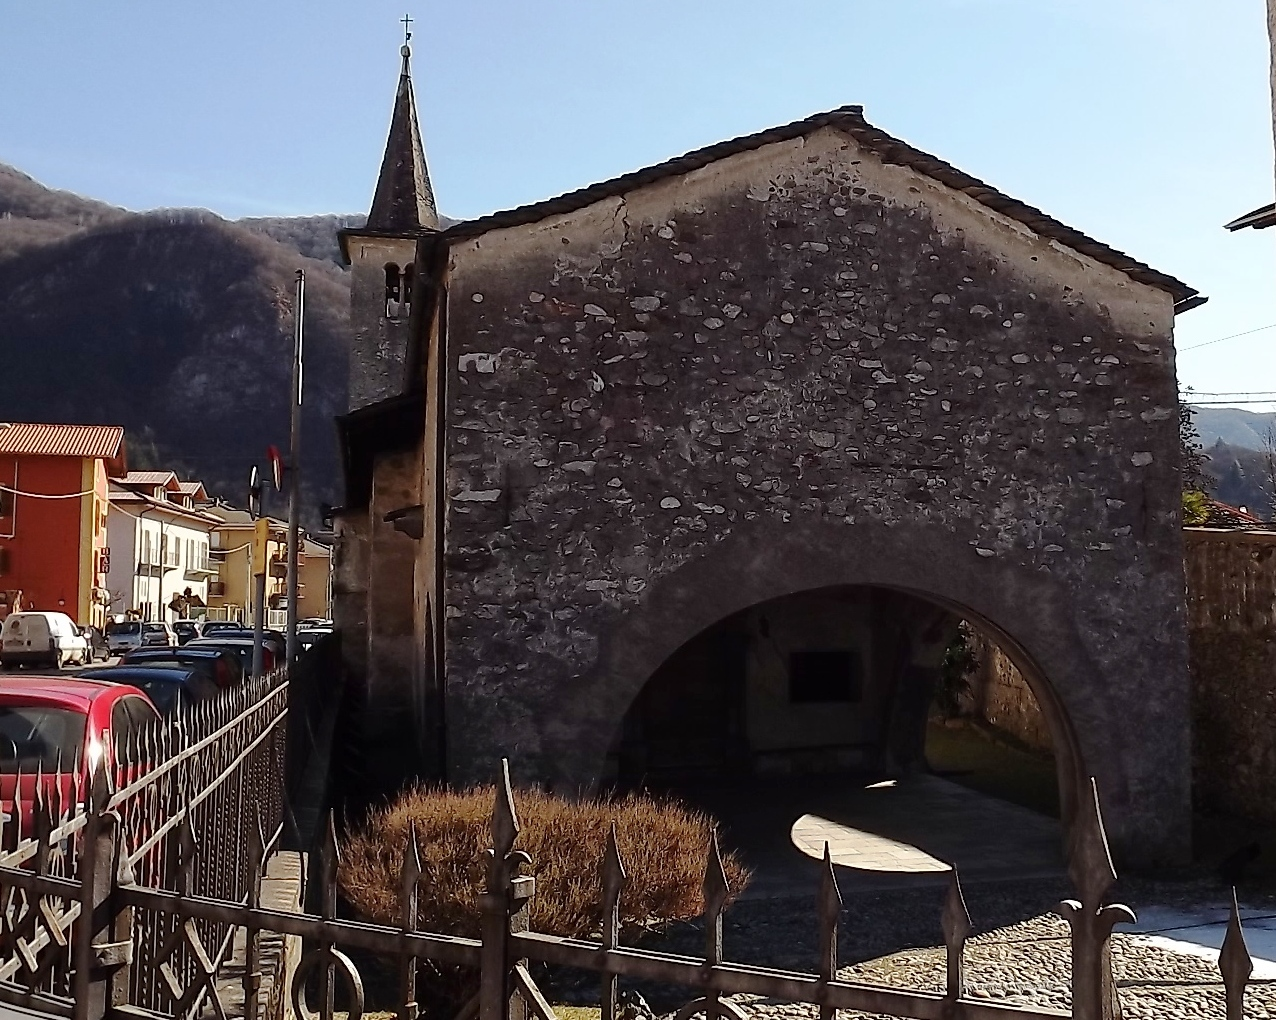 1 Varallo, foto 11a, S.Marco